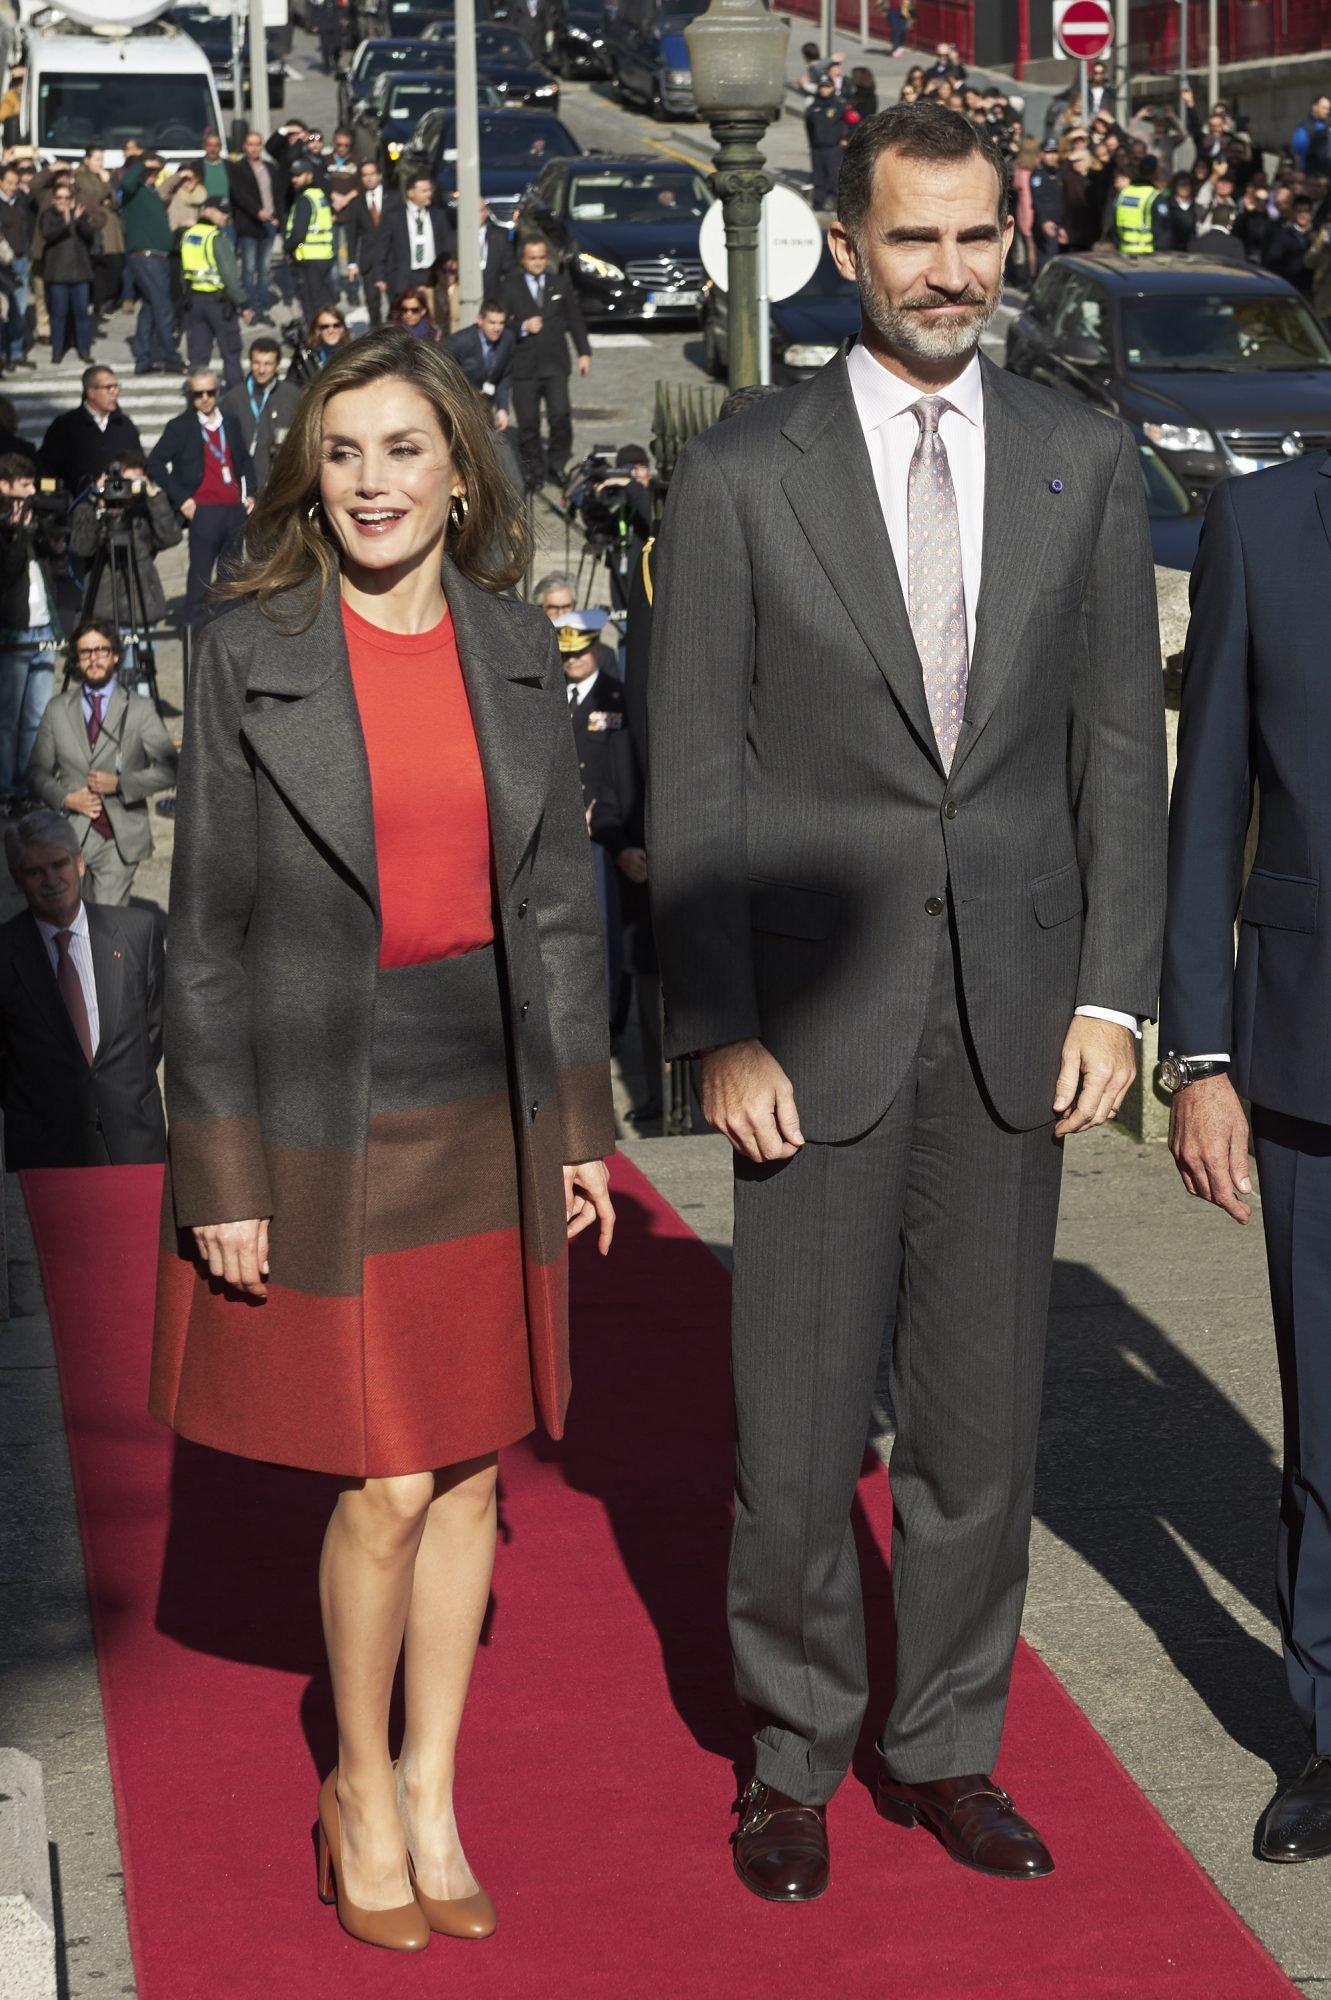 PORTO, PORTUGAL - NOVEMBER 29: King Felipe of Spain and Queen Letizia of Spain visit the Palacio de la Bolsa during their official visit to Portugal on November 29, 2016 in Porto, Portugal. (Photo by Carlos Alvarez/Getty Images)